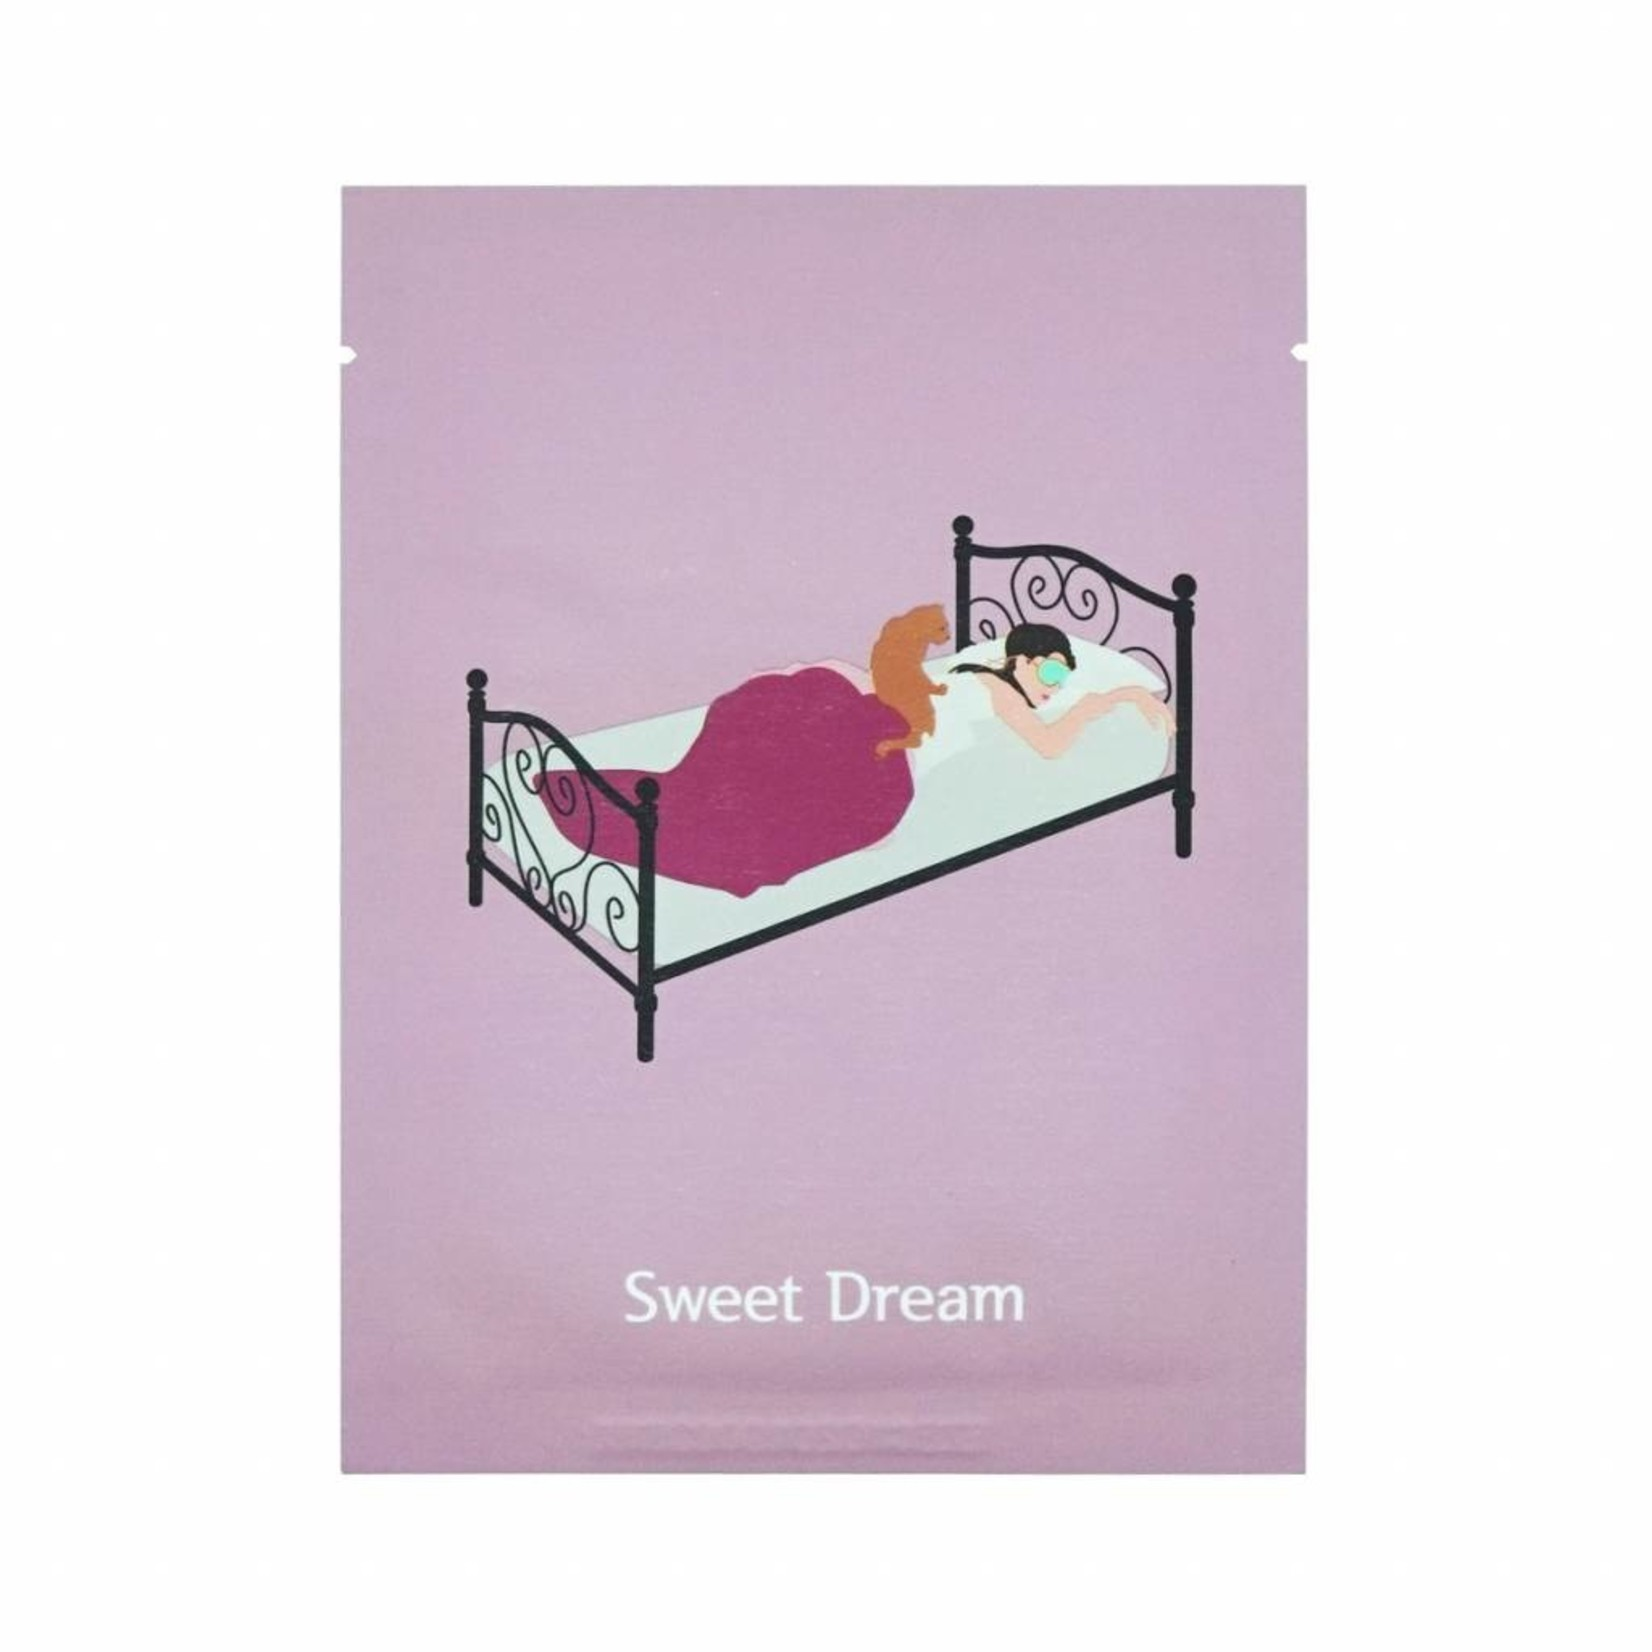 PACK-age Sweet Dream deep sleeping mask 10pcs